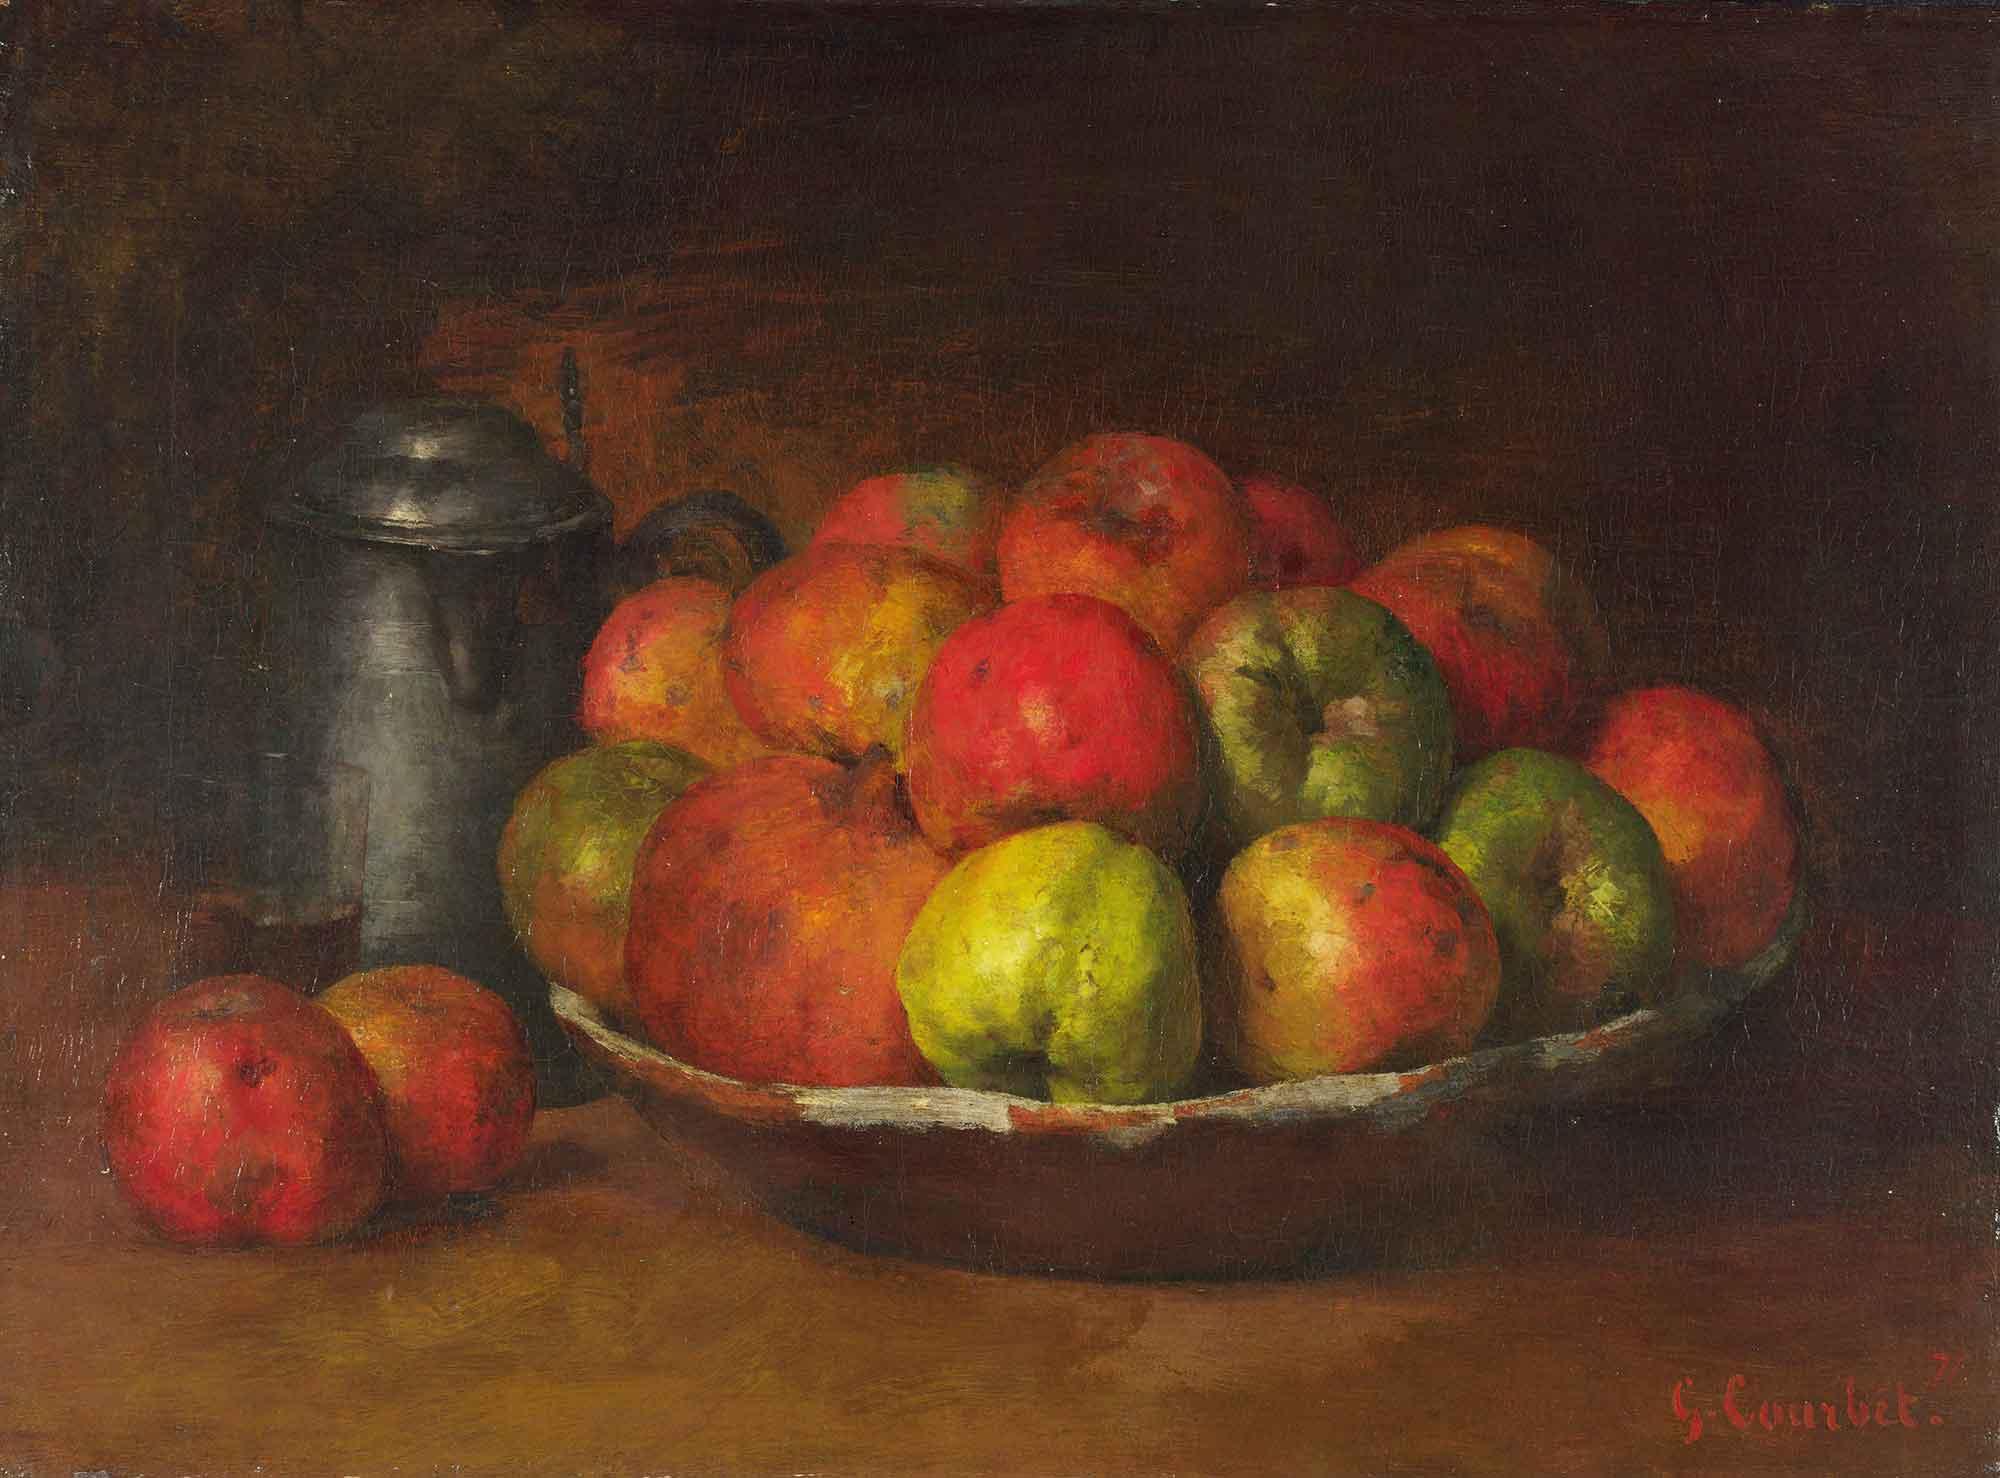 Gustave Courbet Elma ve Narlı Natürmort